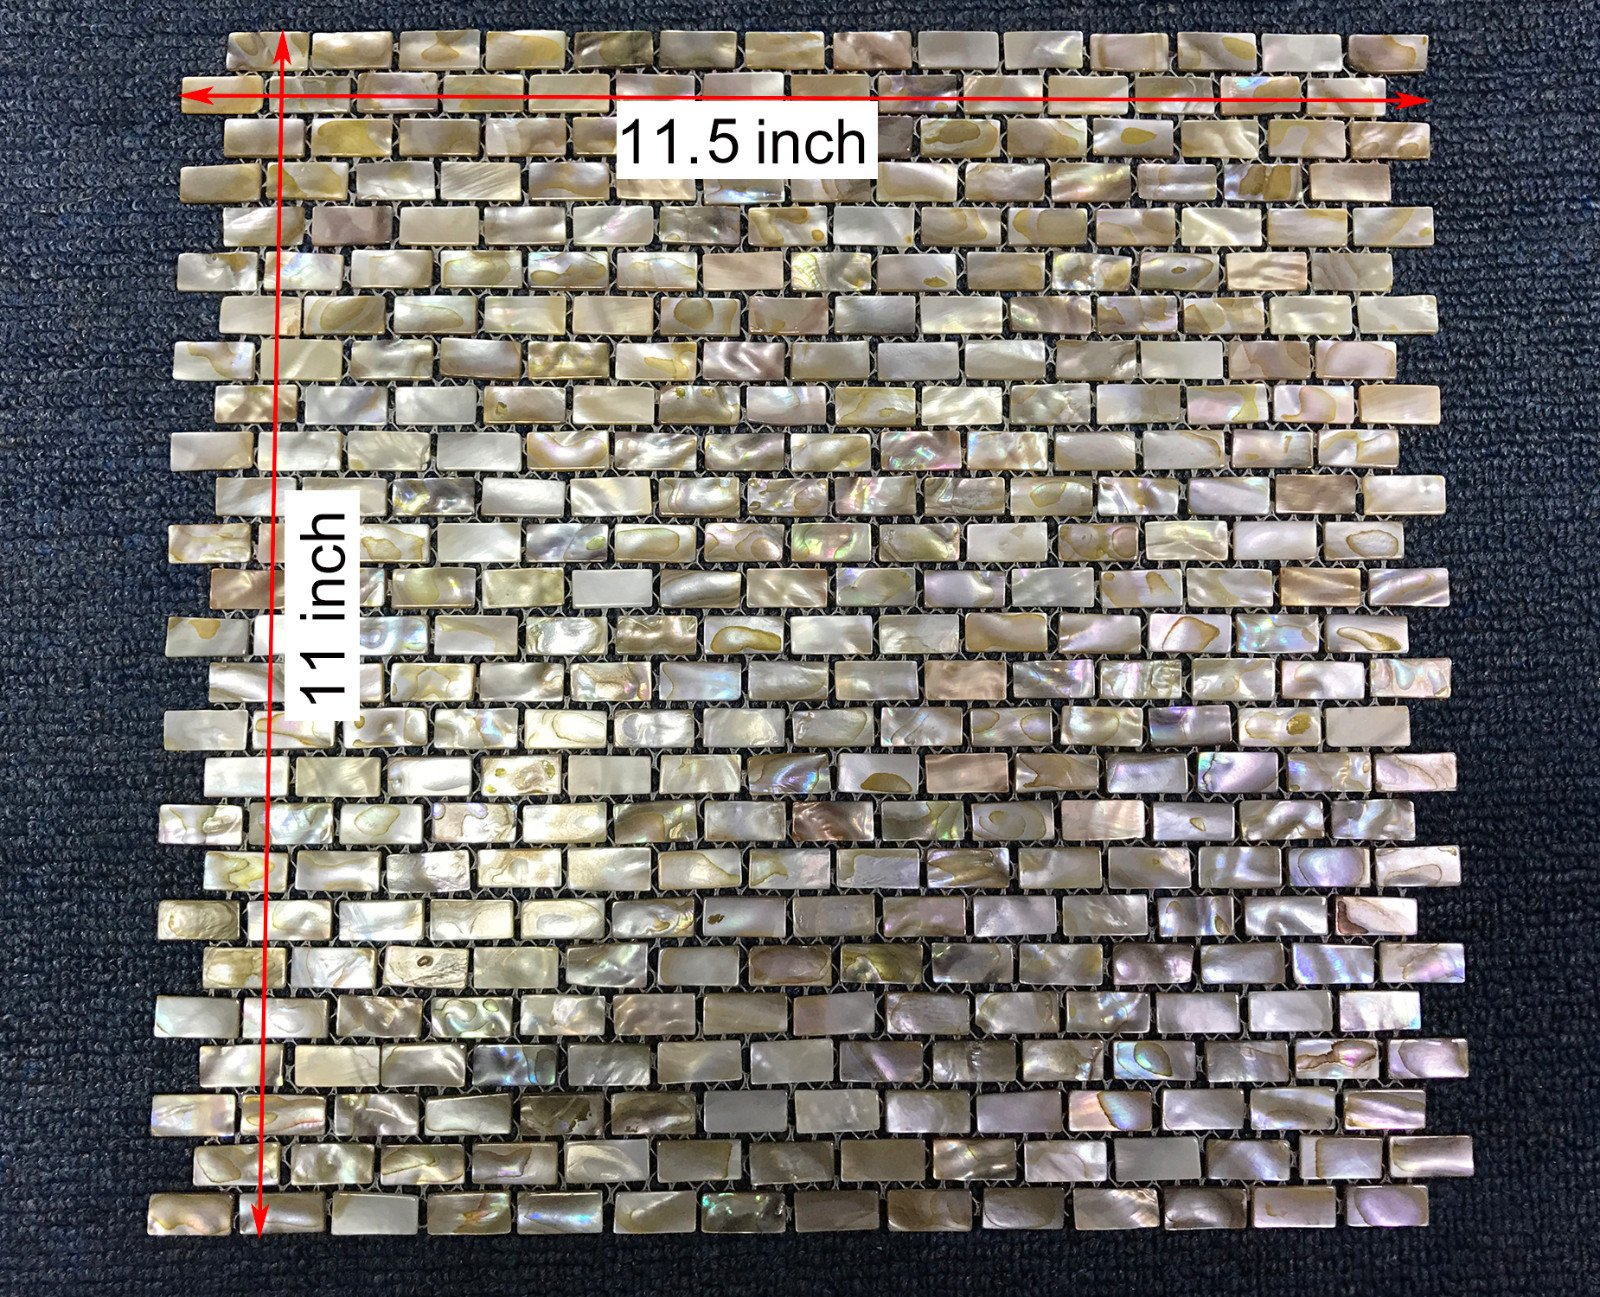 CHOIS Wholesale Mother of Pearl Shell Backsplash I-Shaped Rectangle Tiles Wall Tile B03S Lot 12PCS